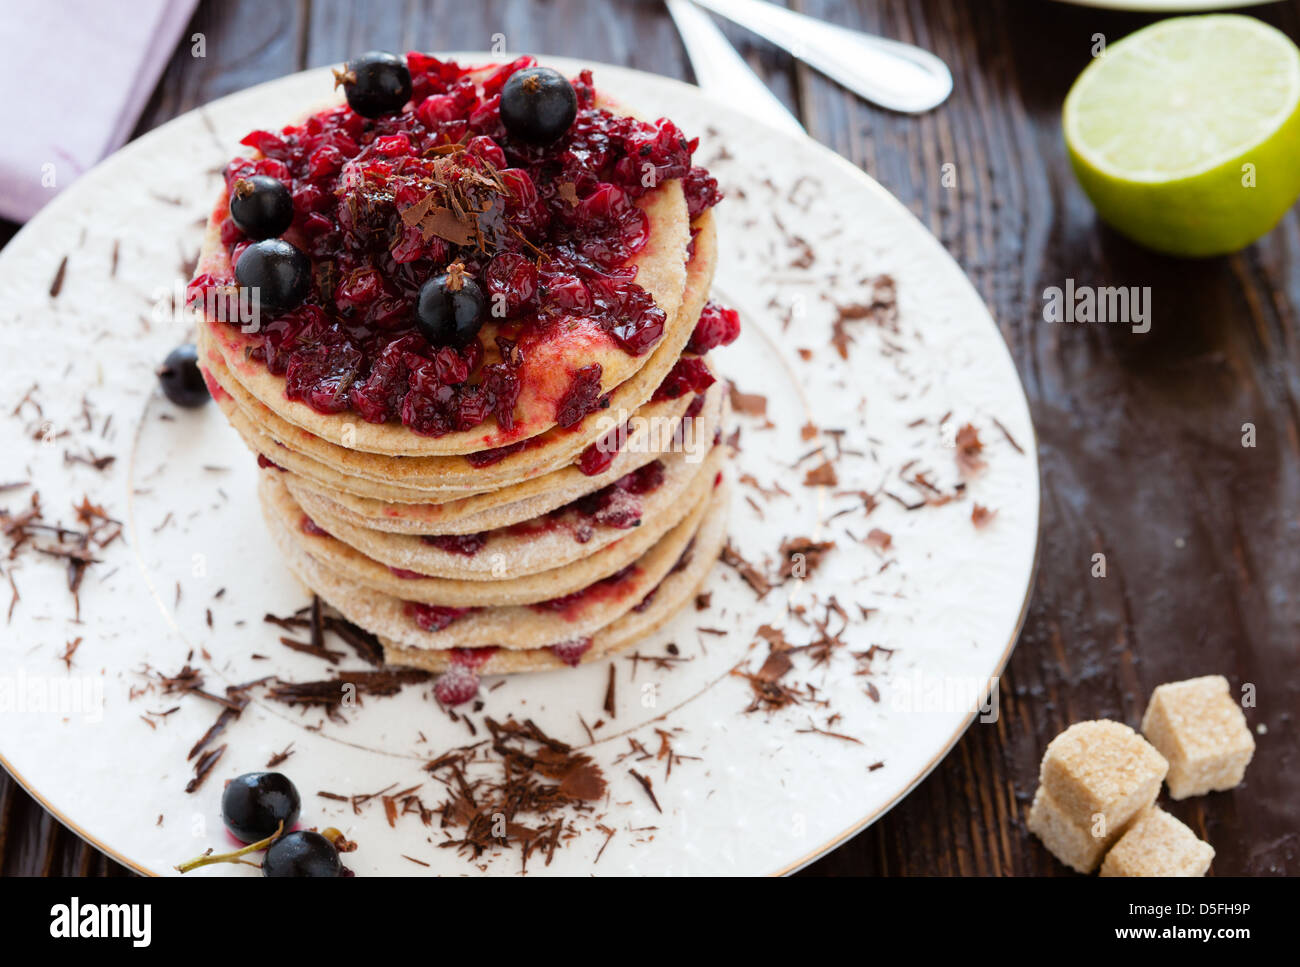 baked food dessert sandwich - Stock Image